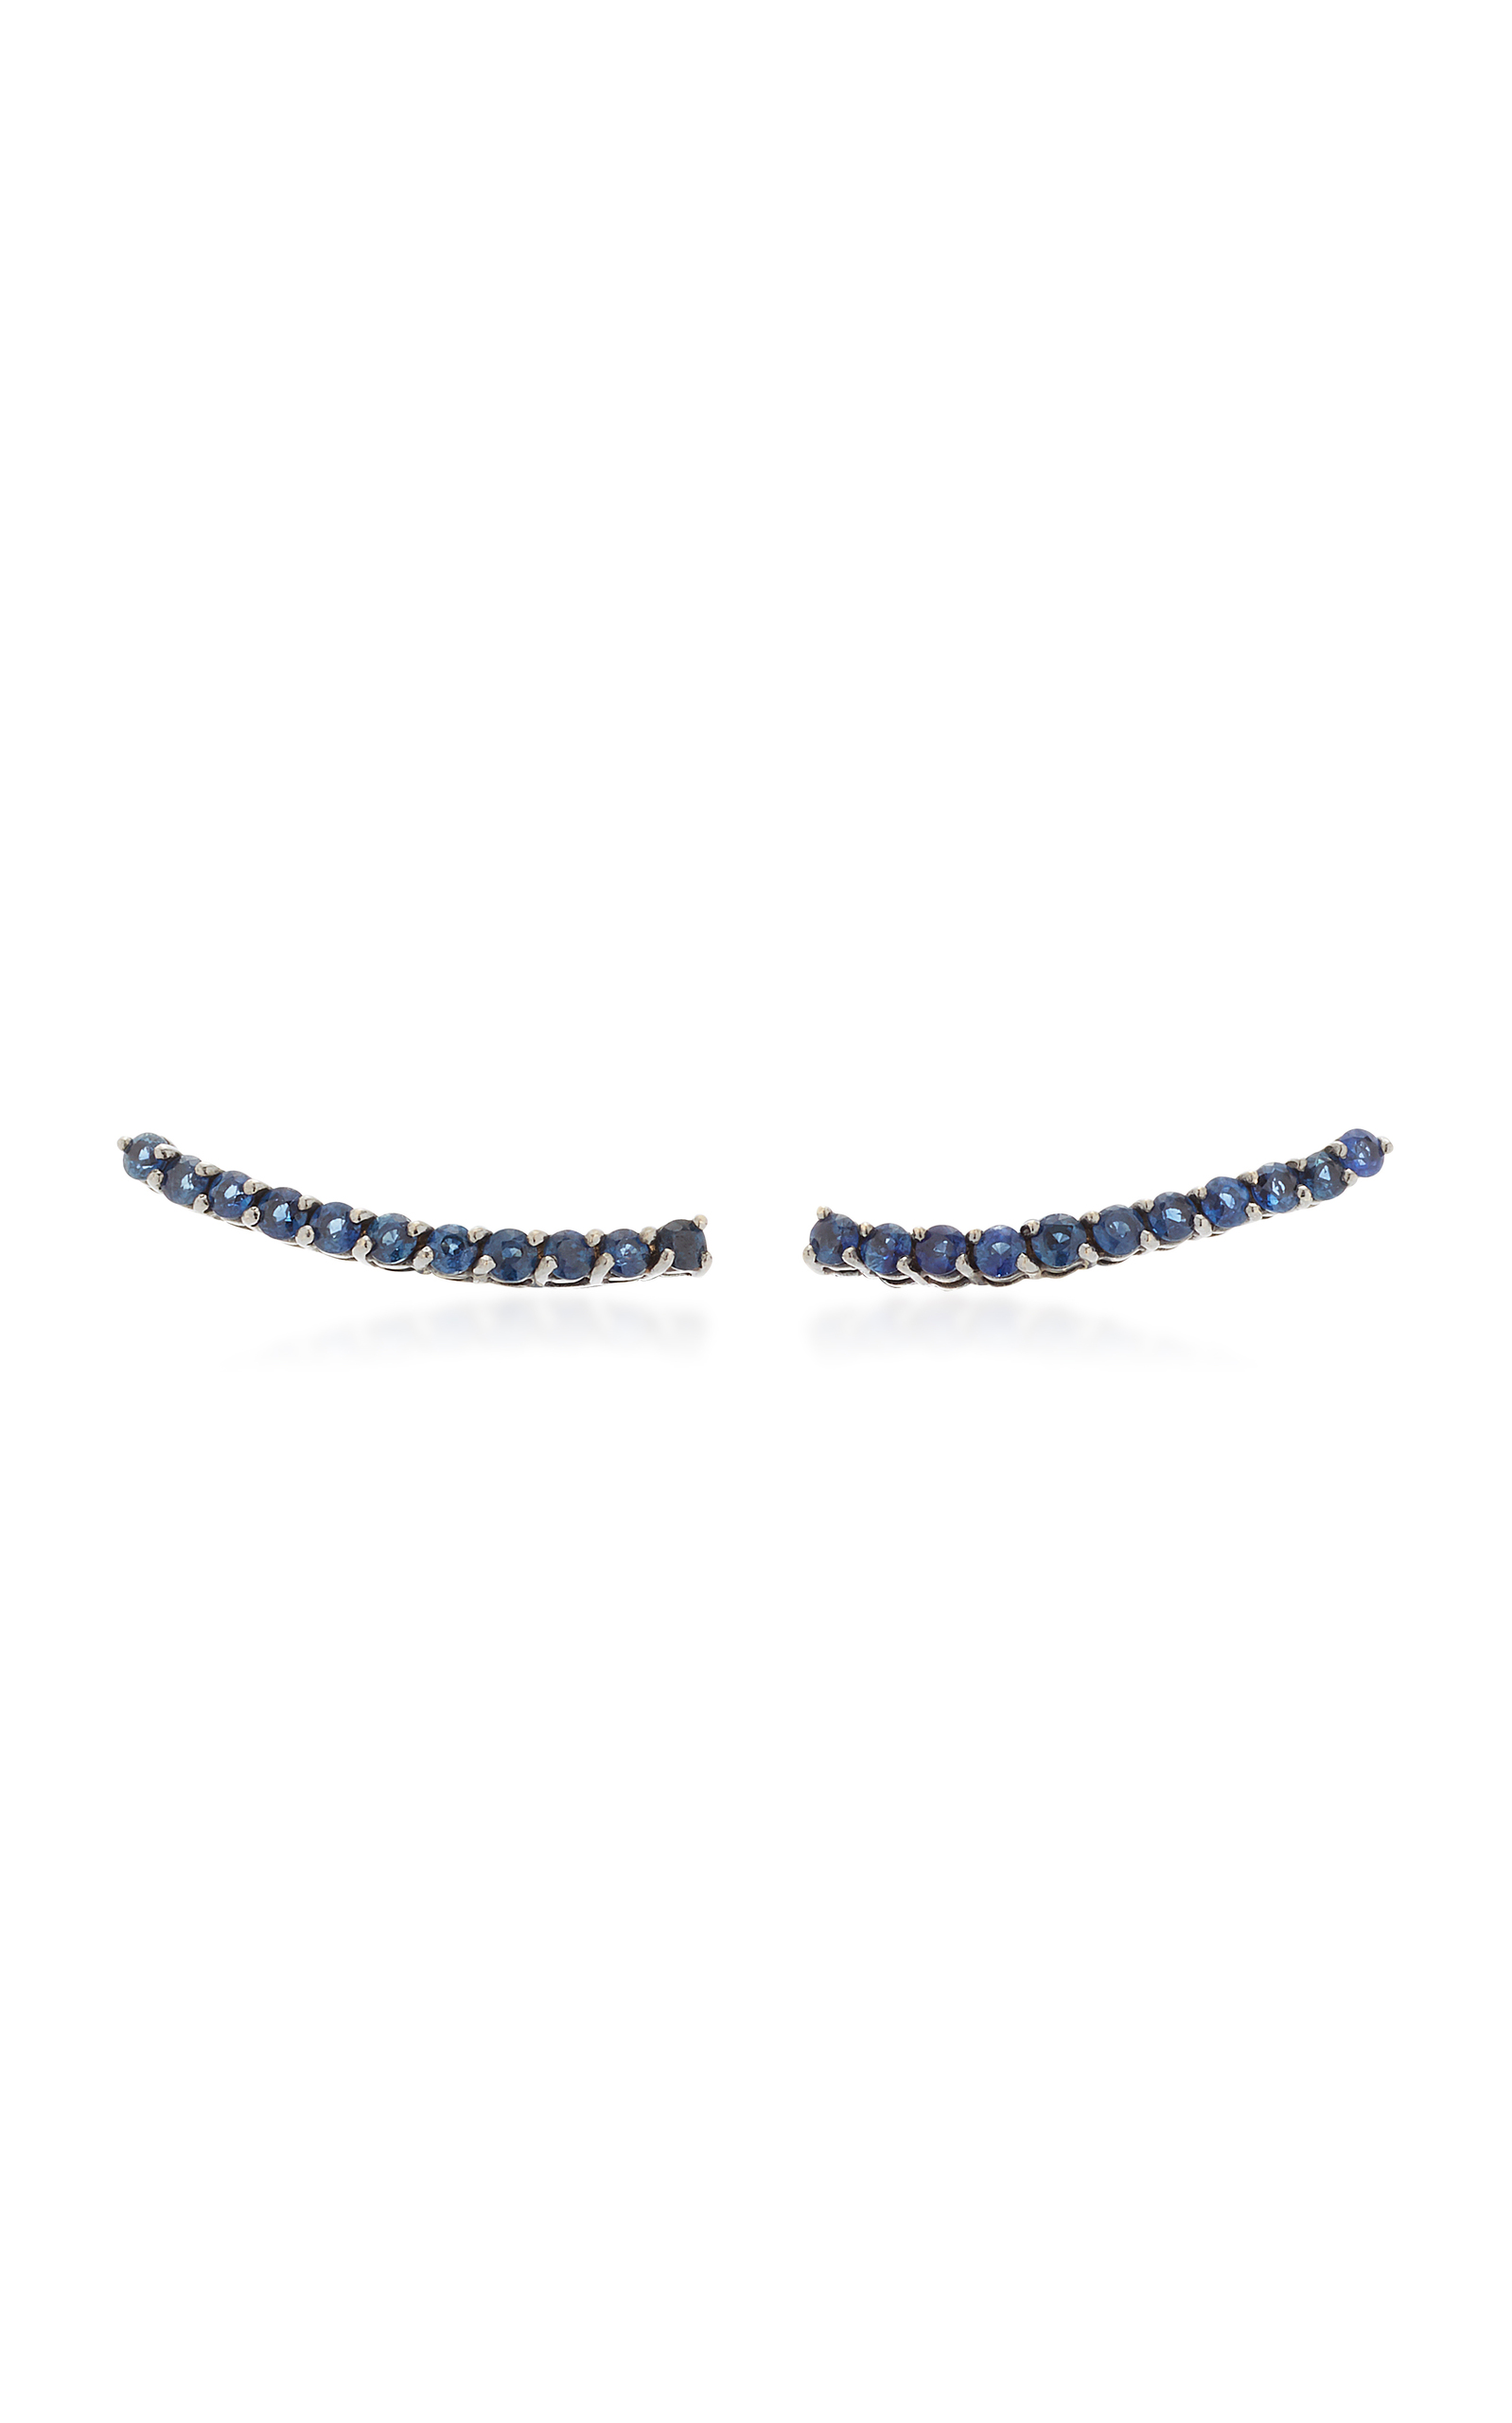 JACK VARTANIAN 18K White Gold And Black Rhodium Sapphire Earrings in Blue